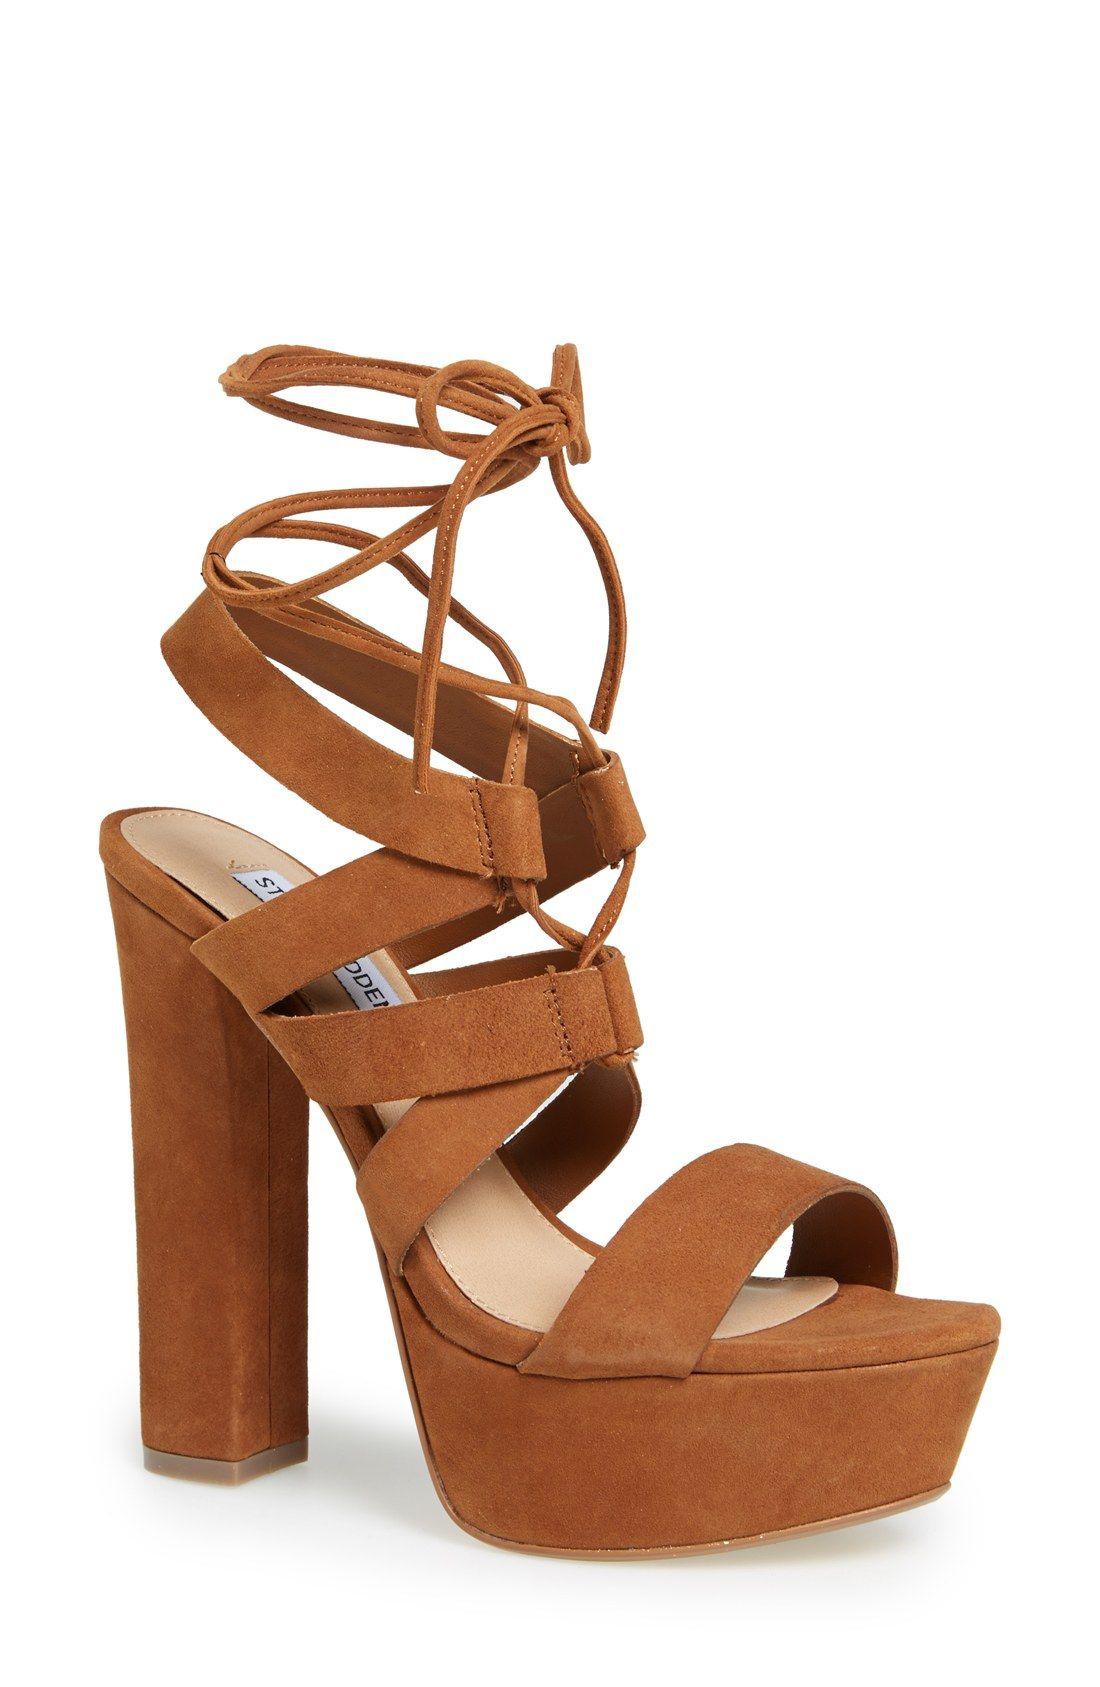 Steve Madden 'Justinaa' Platform Sandal